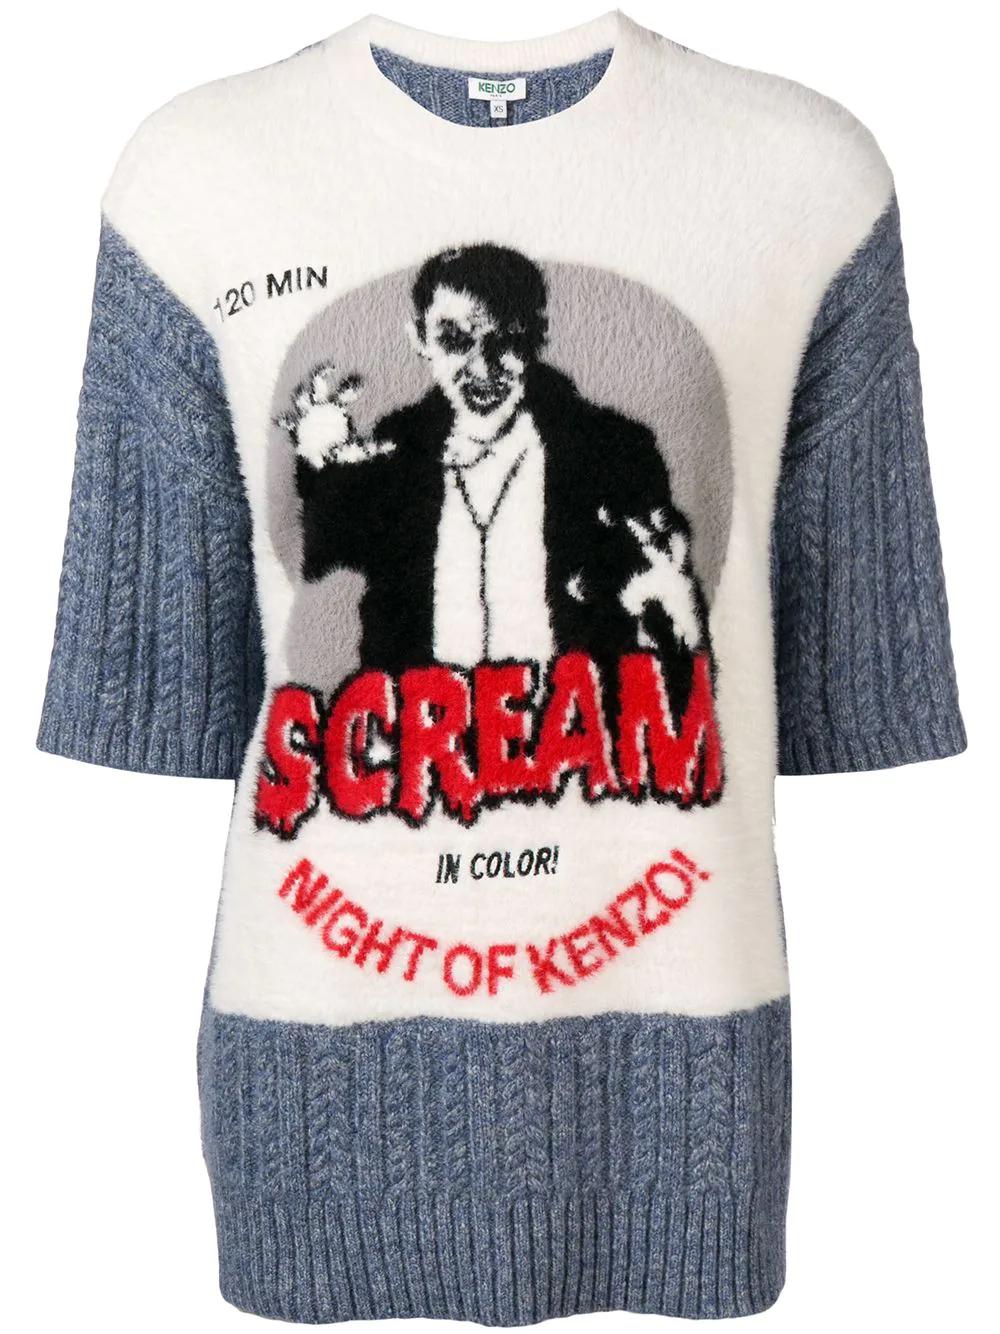 KENZO | трикотажный джемпер 'Scream' | Clouty